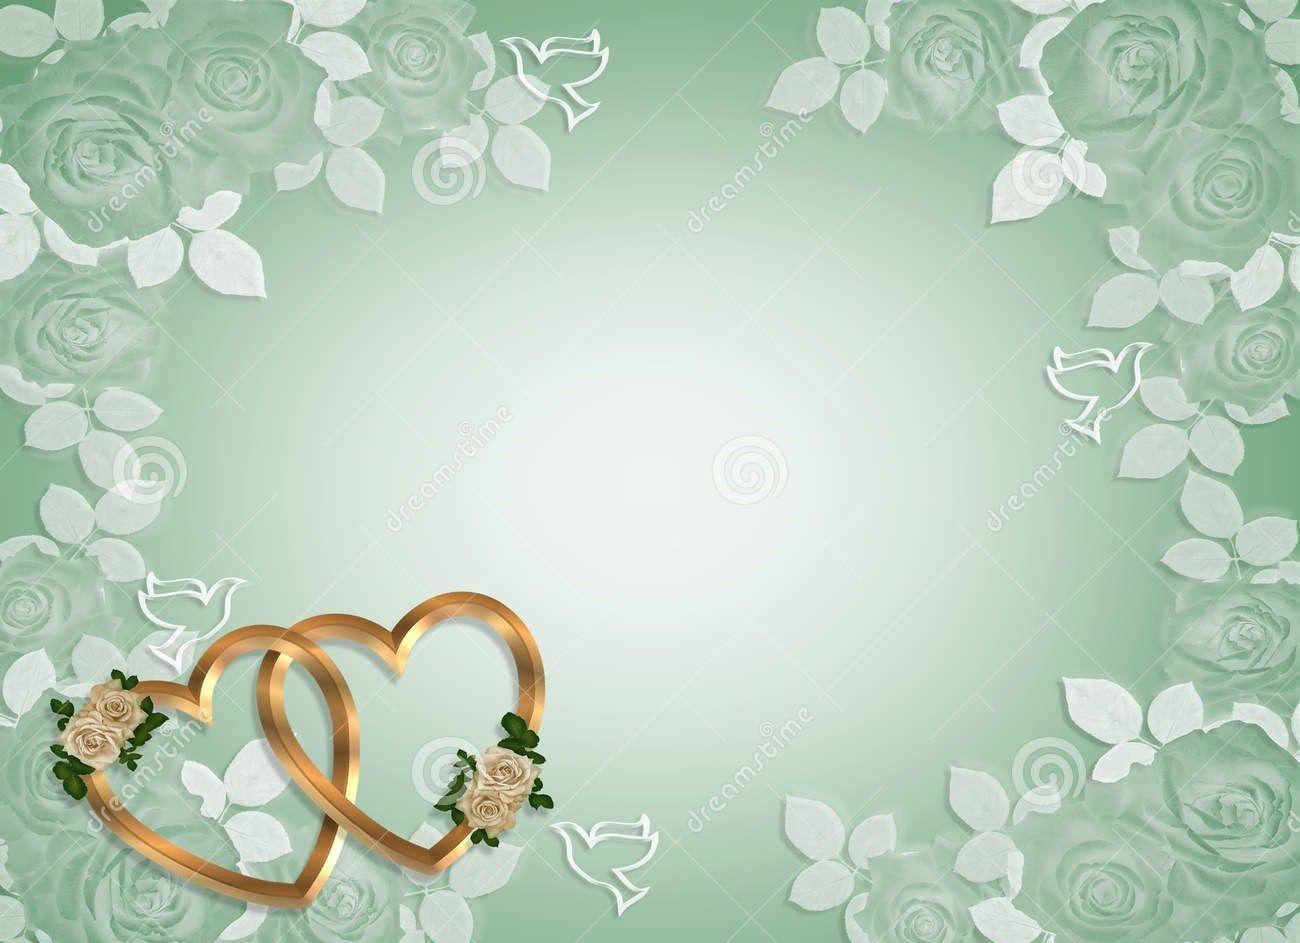 Best Wedding Invitation Cards Samples Blank Wedding Invitation